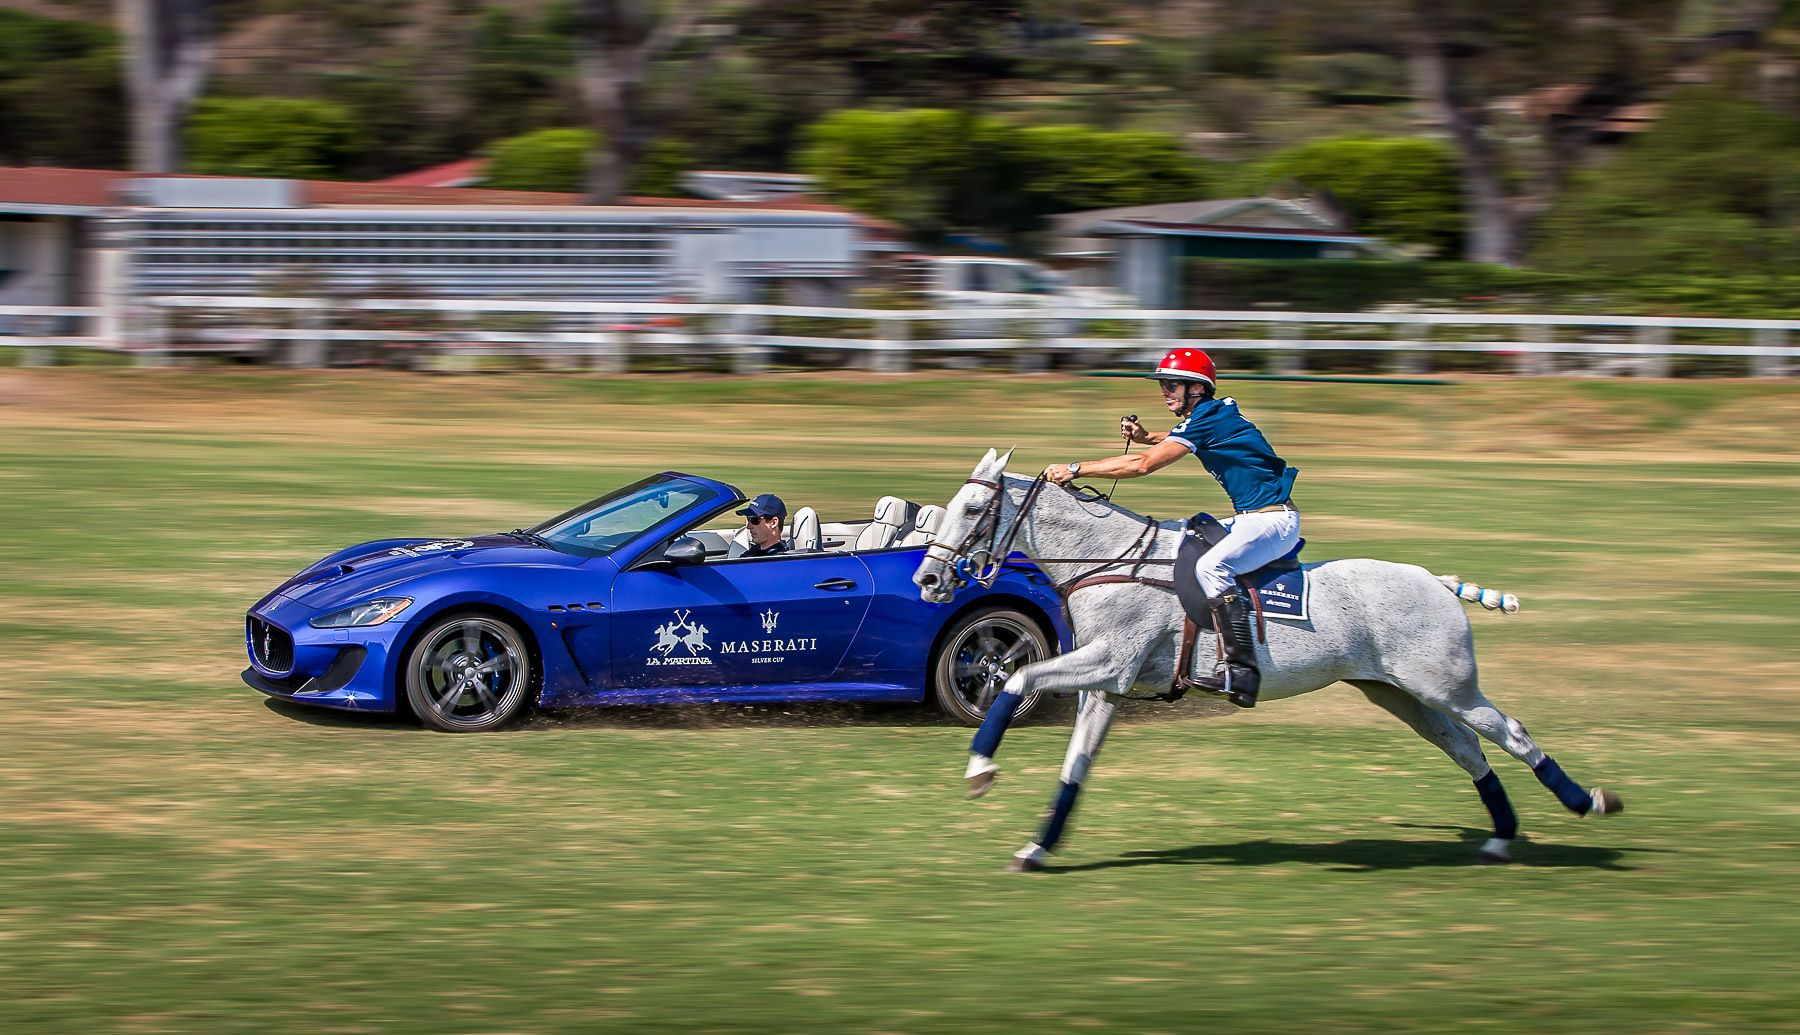 Maserati, Polo, Santa Barbara, CA